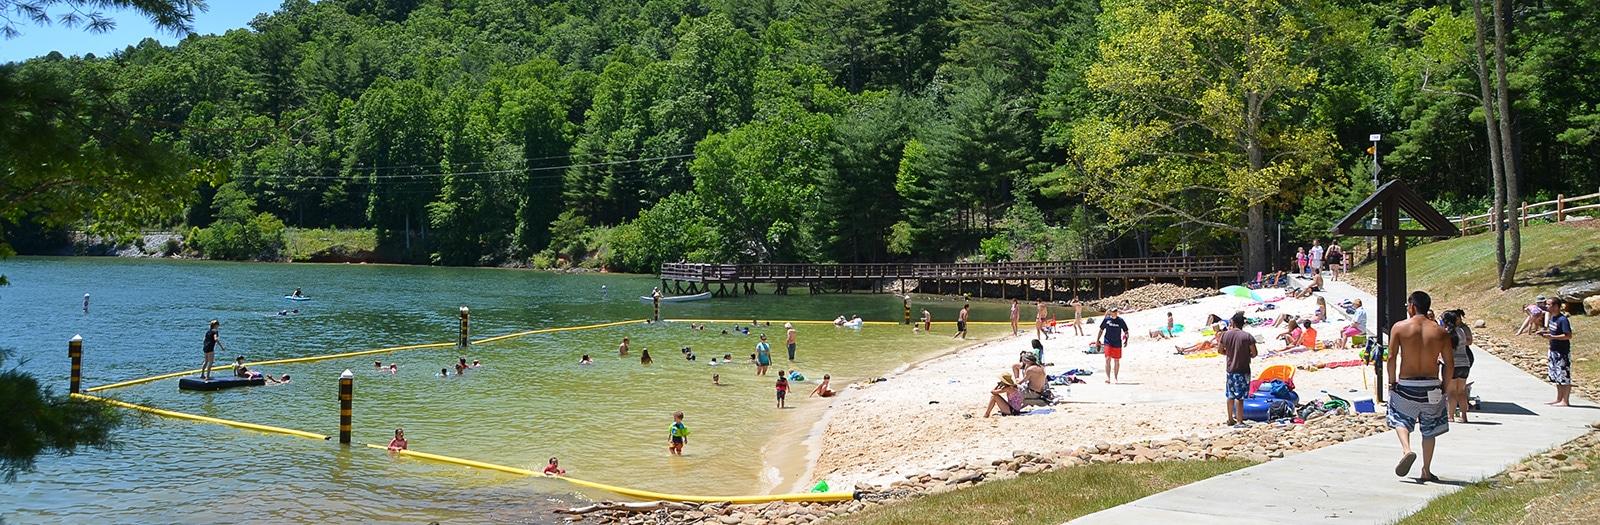 Photo of Lake Glenville Swimming